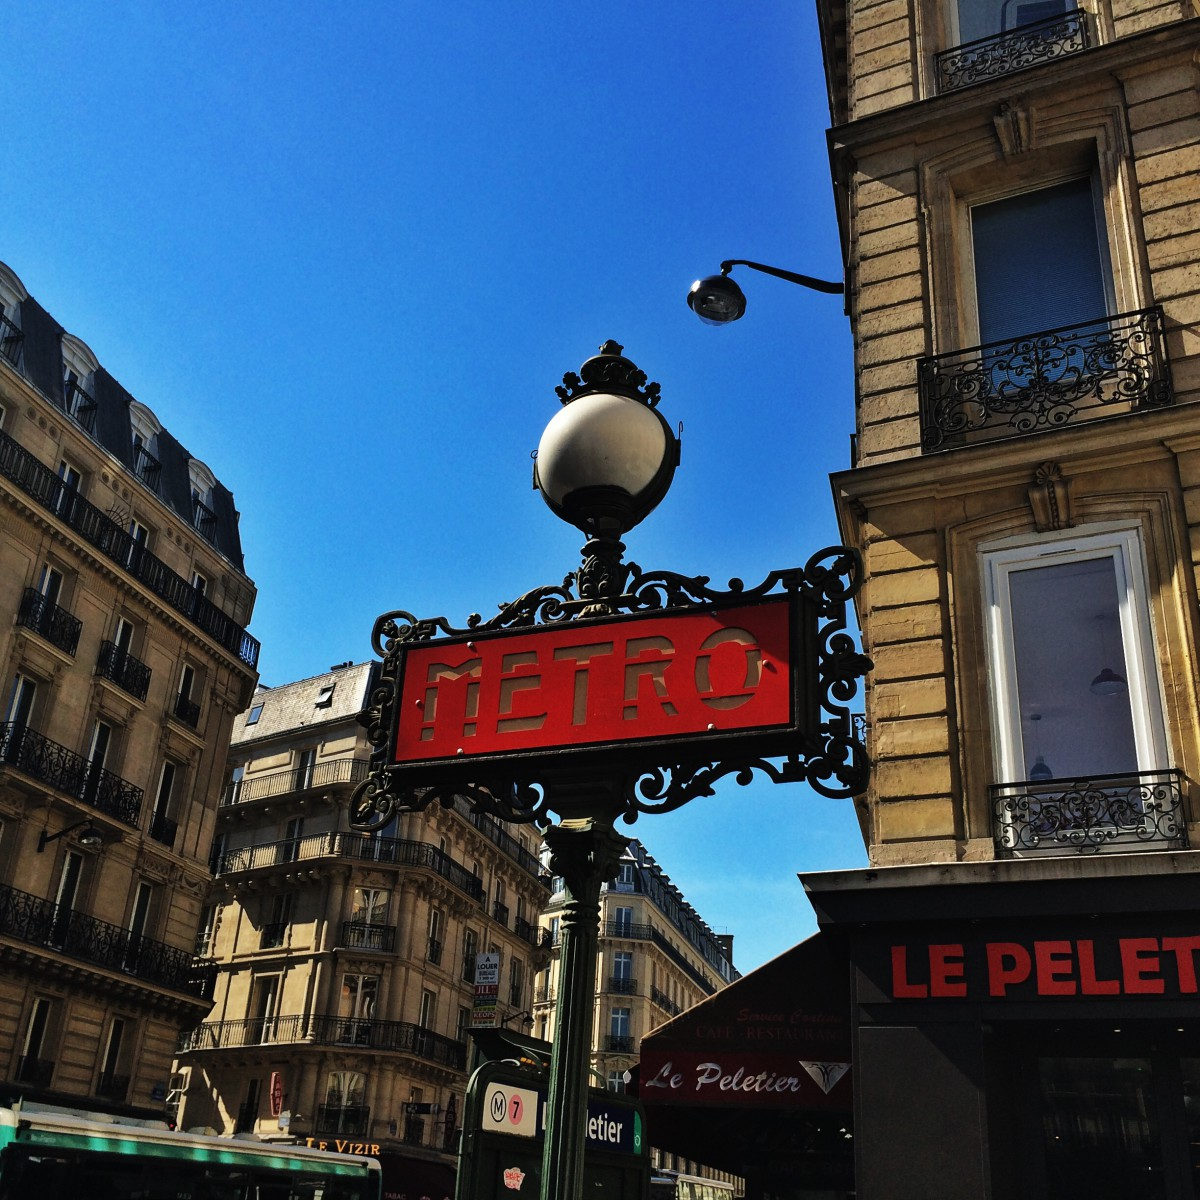 Metro Station on La Fayette, Paris, France